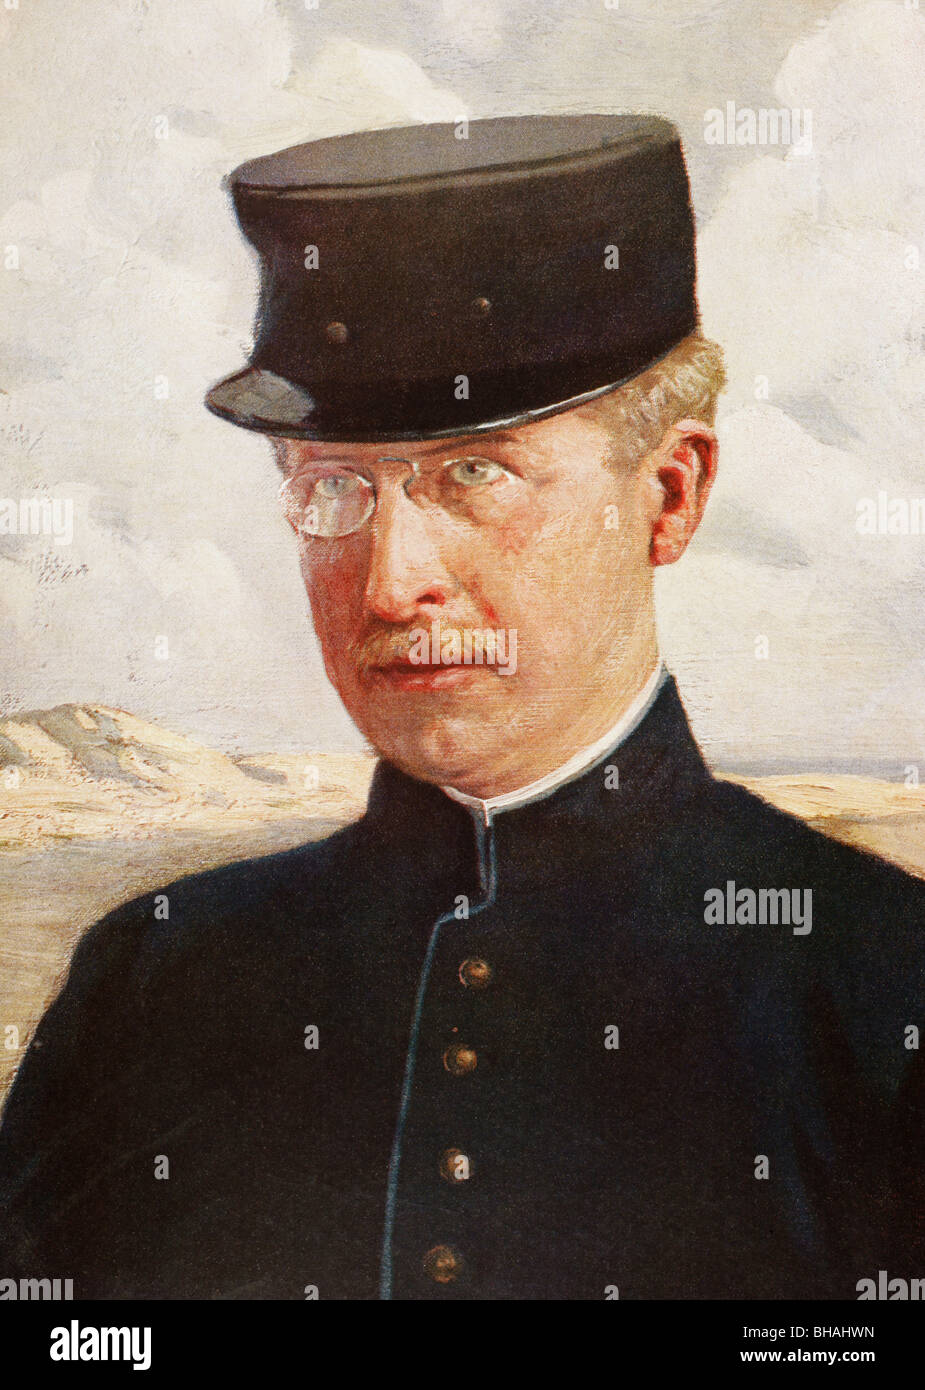 Albert Ier, Roi des Belges, 1875 - 1934. Photo Stock